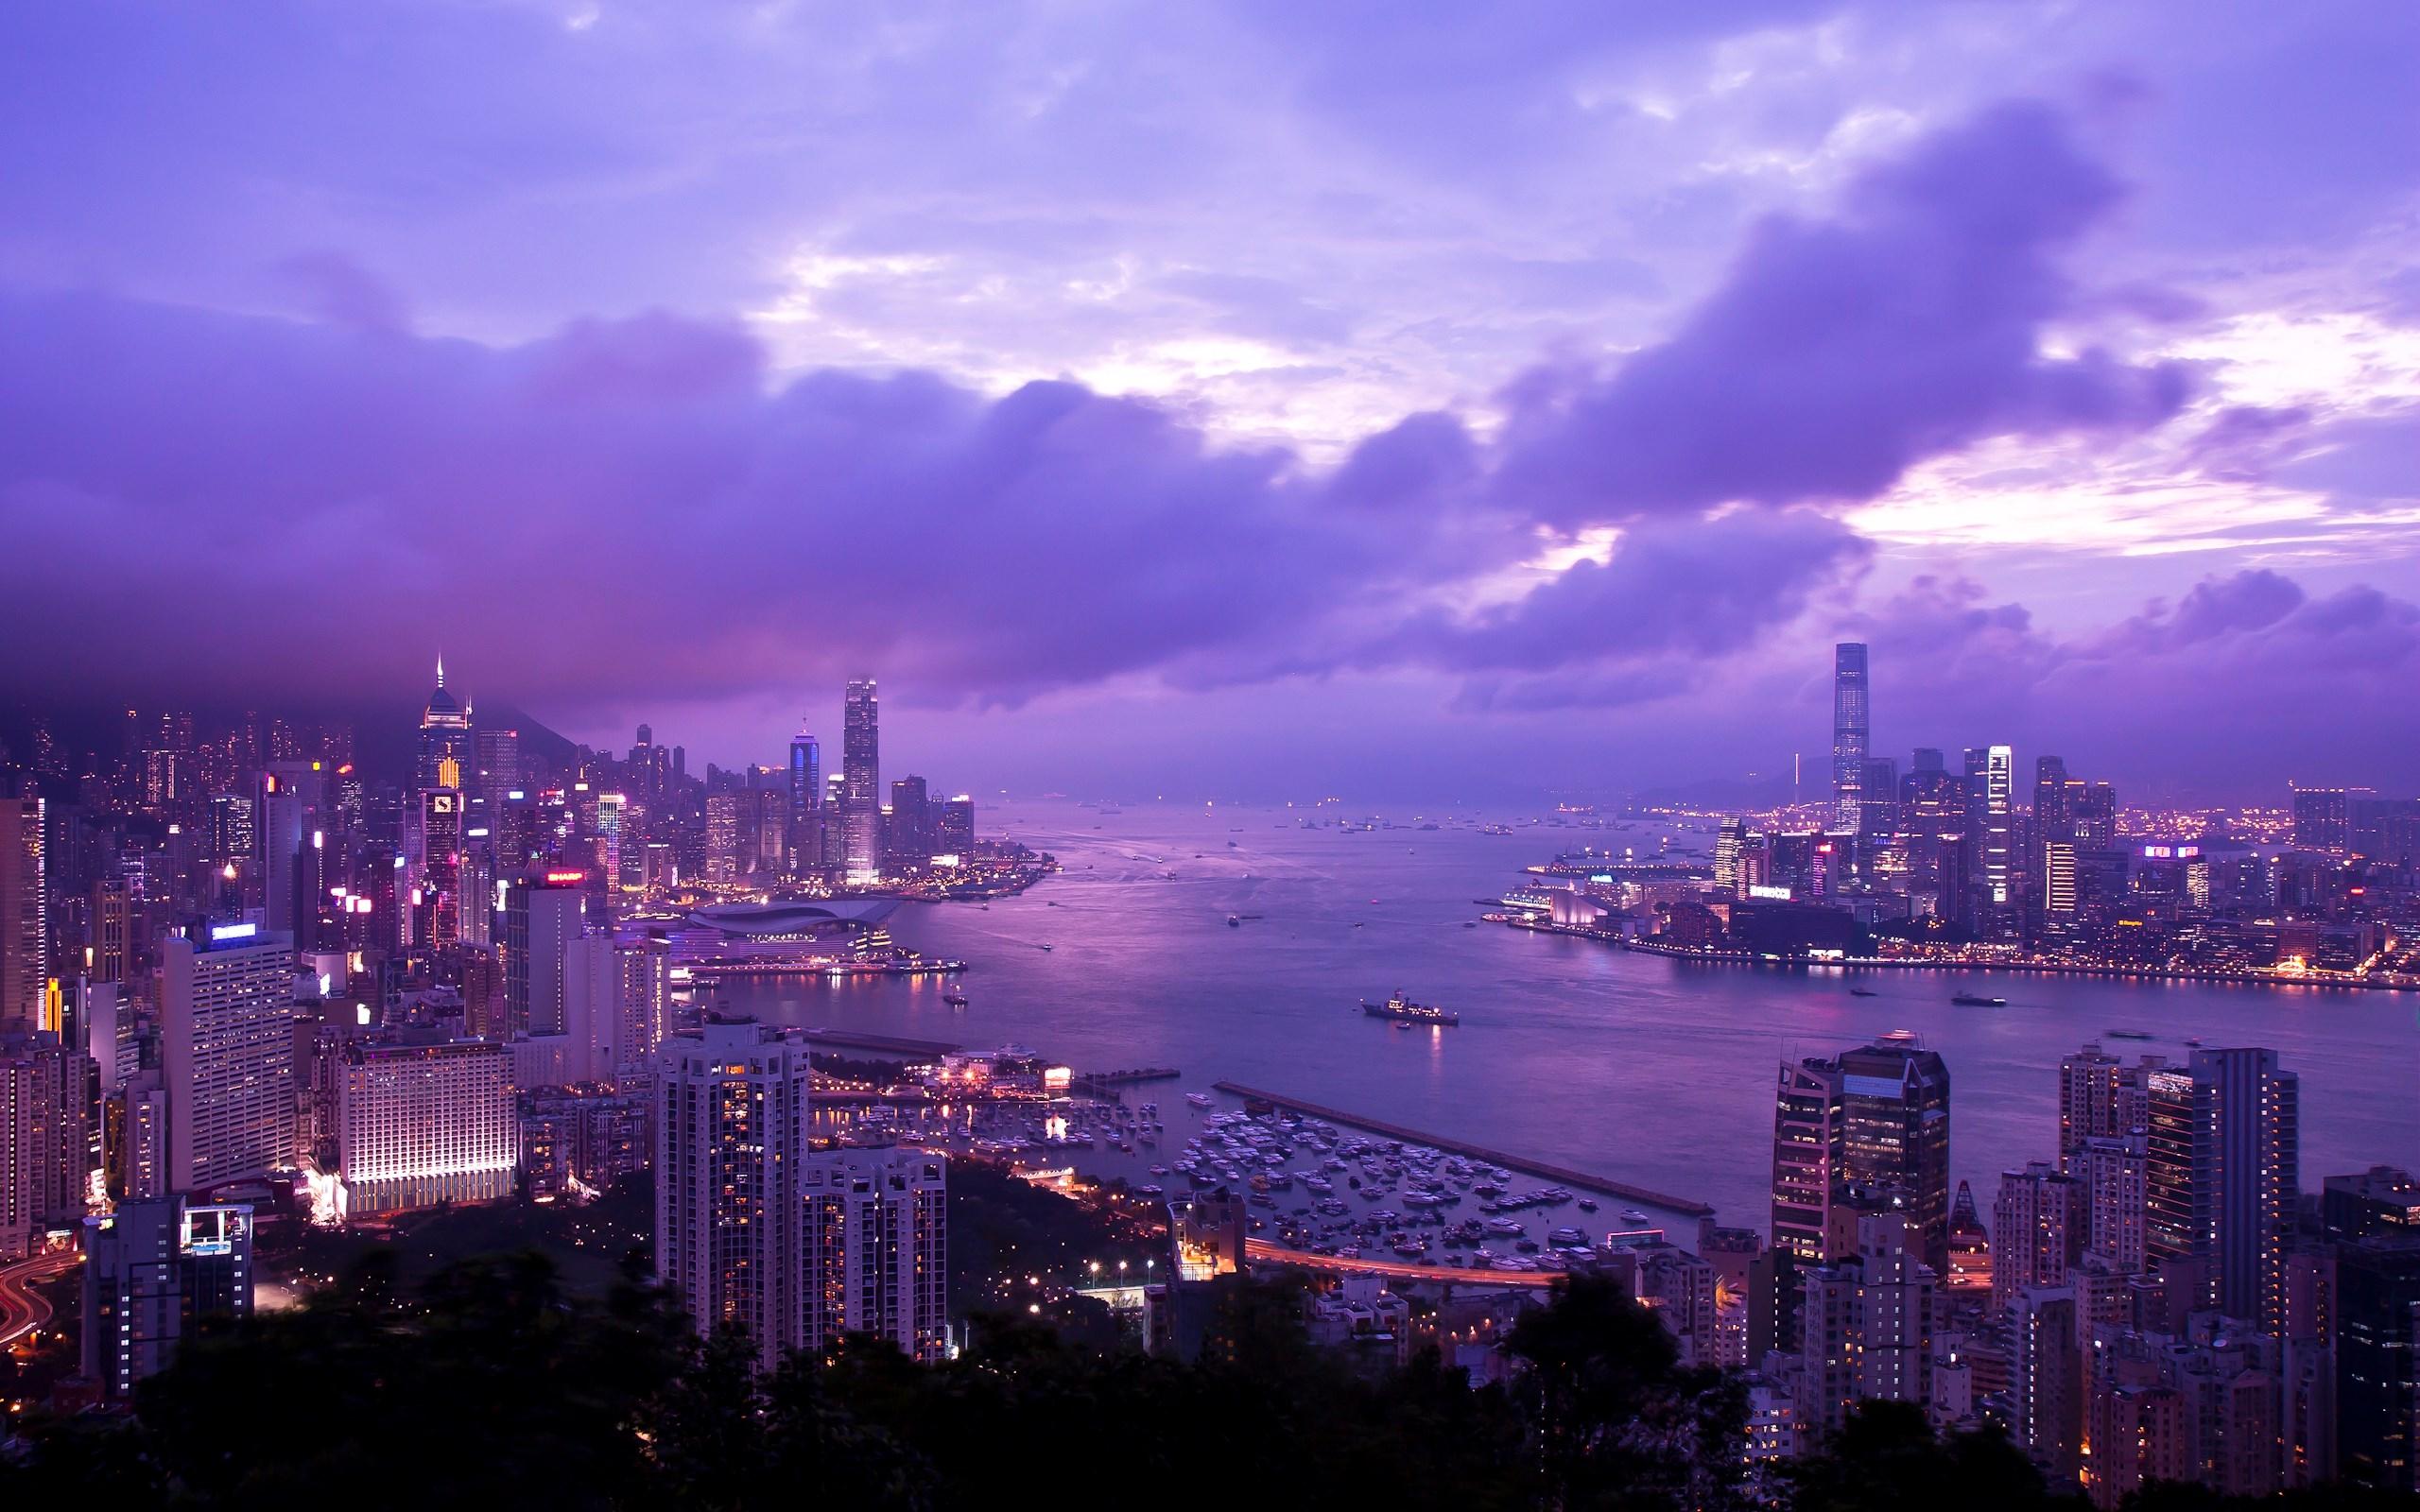 hong-kong-1080p-windows-Berton-Leapman-wallpaper-wpc5806008